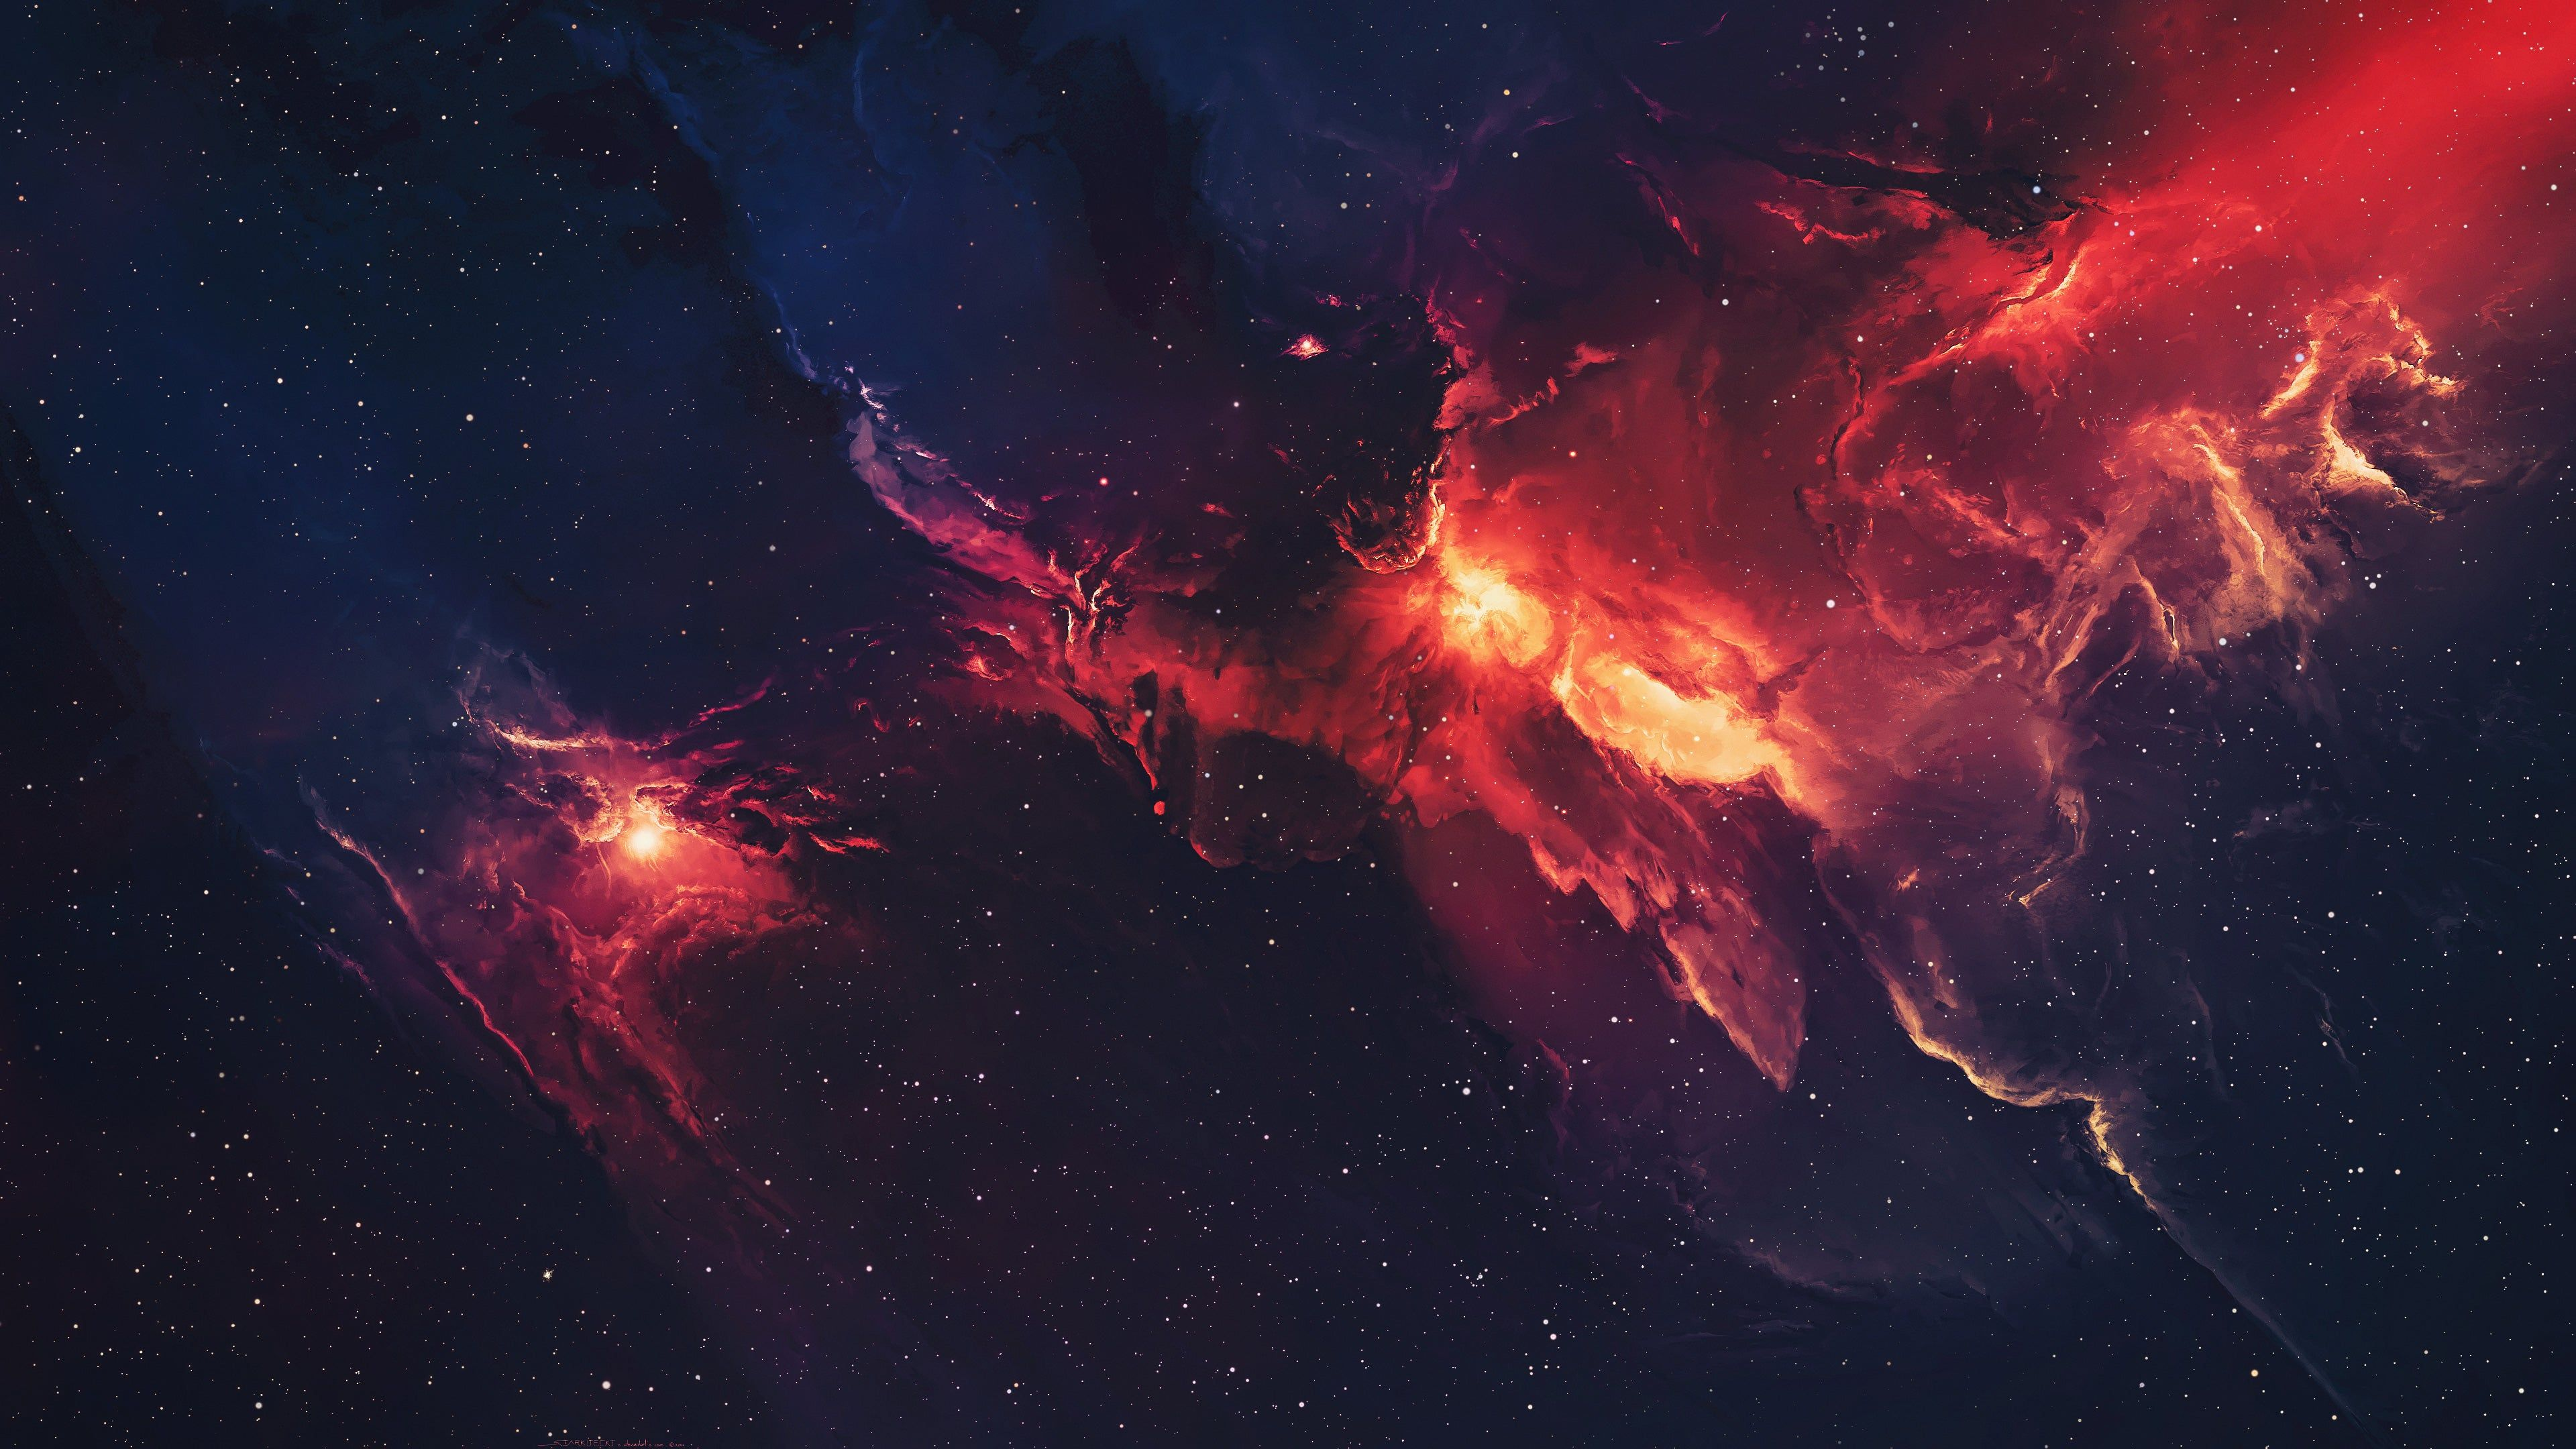 Red And Blue Nebula 4k Wallpaper Nebula Wallpaper Galaxy Wallpaper Star Wallpaper